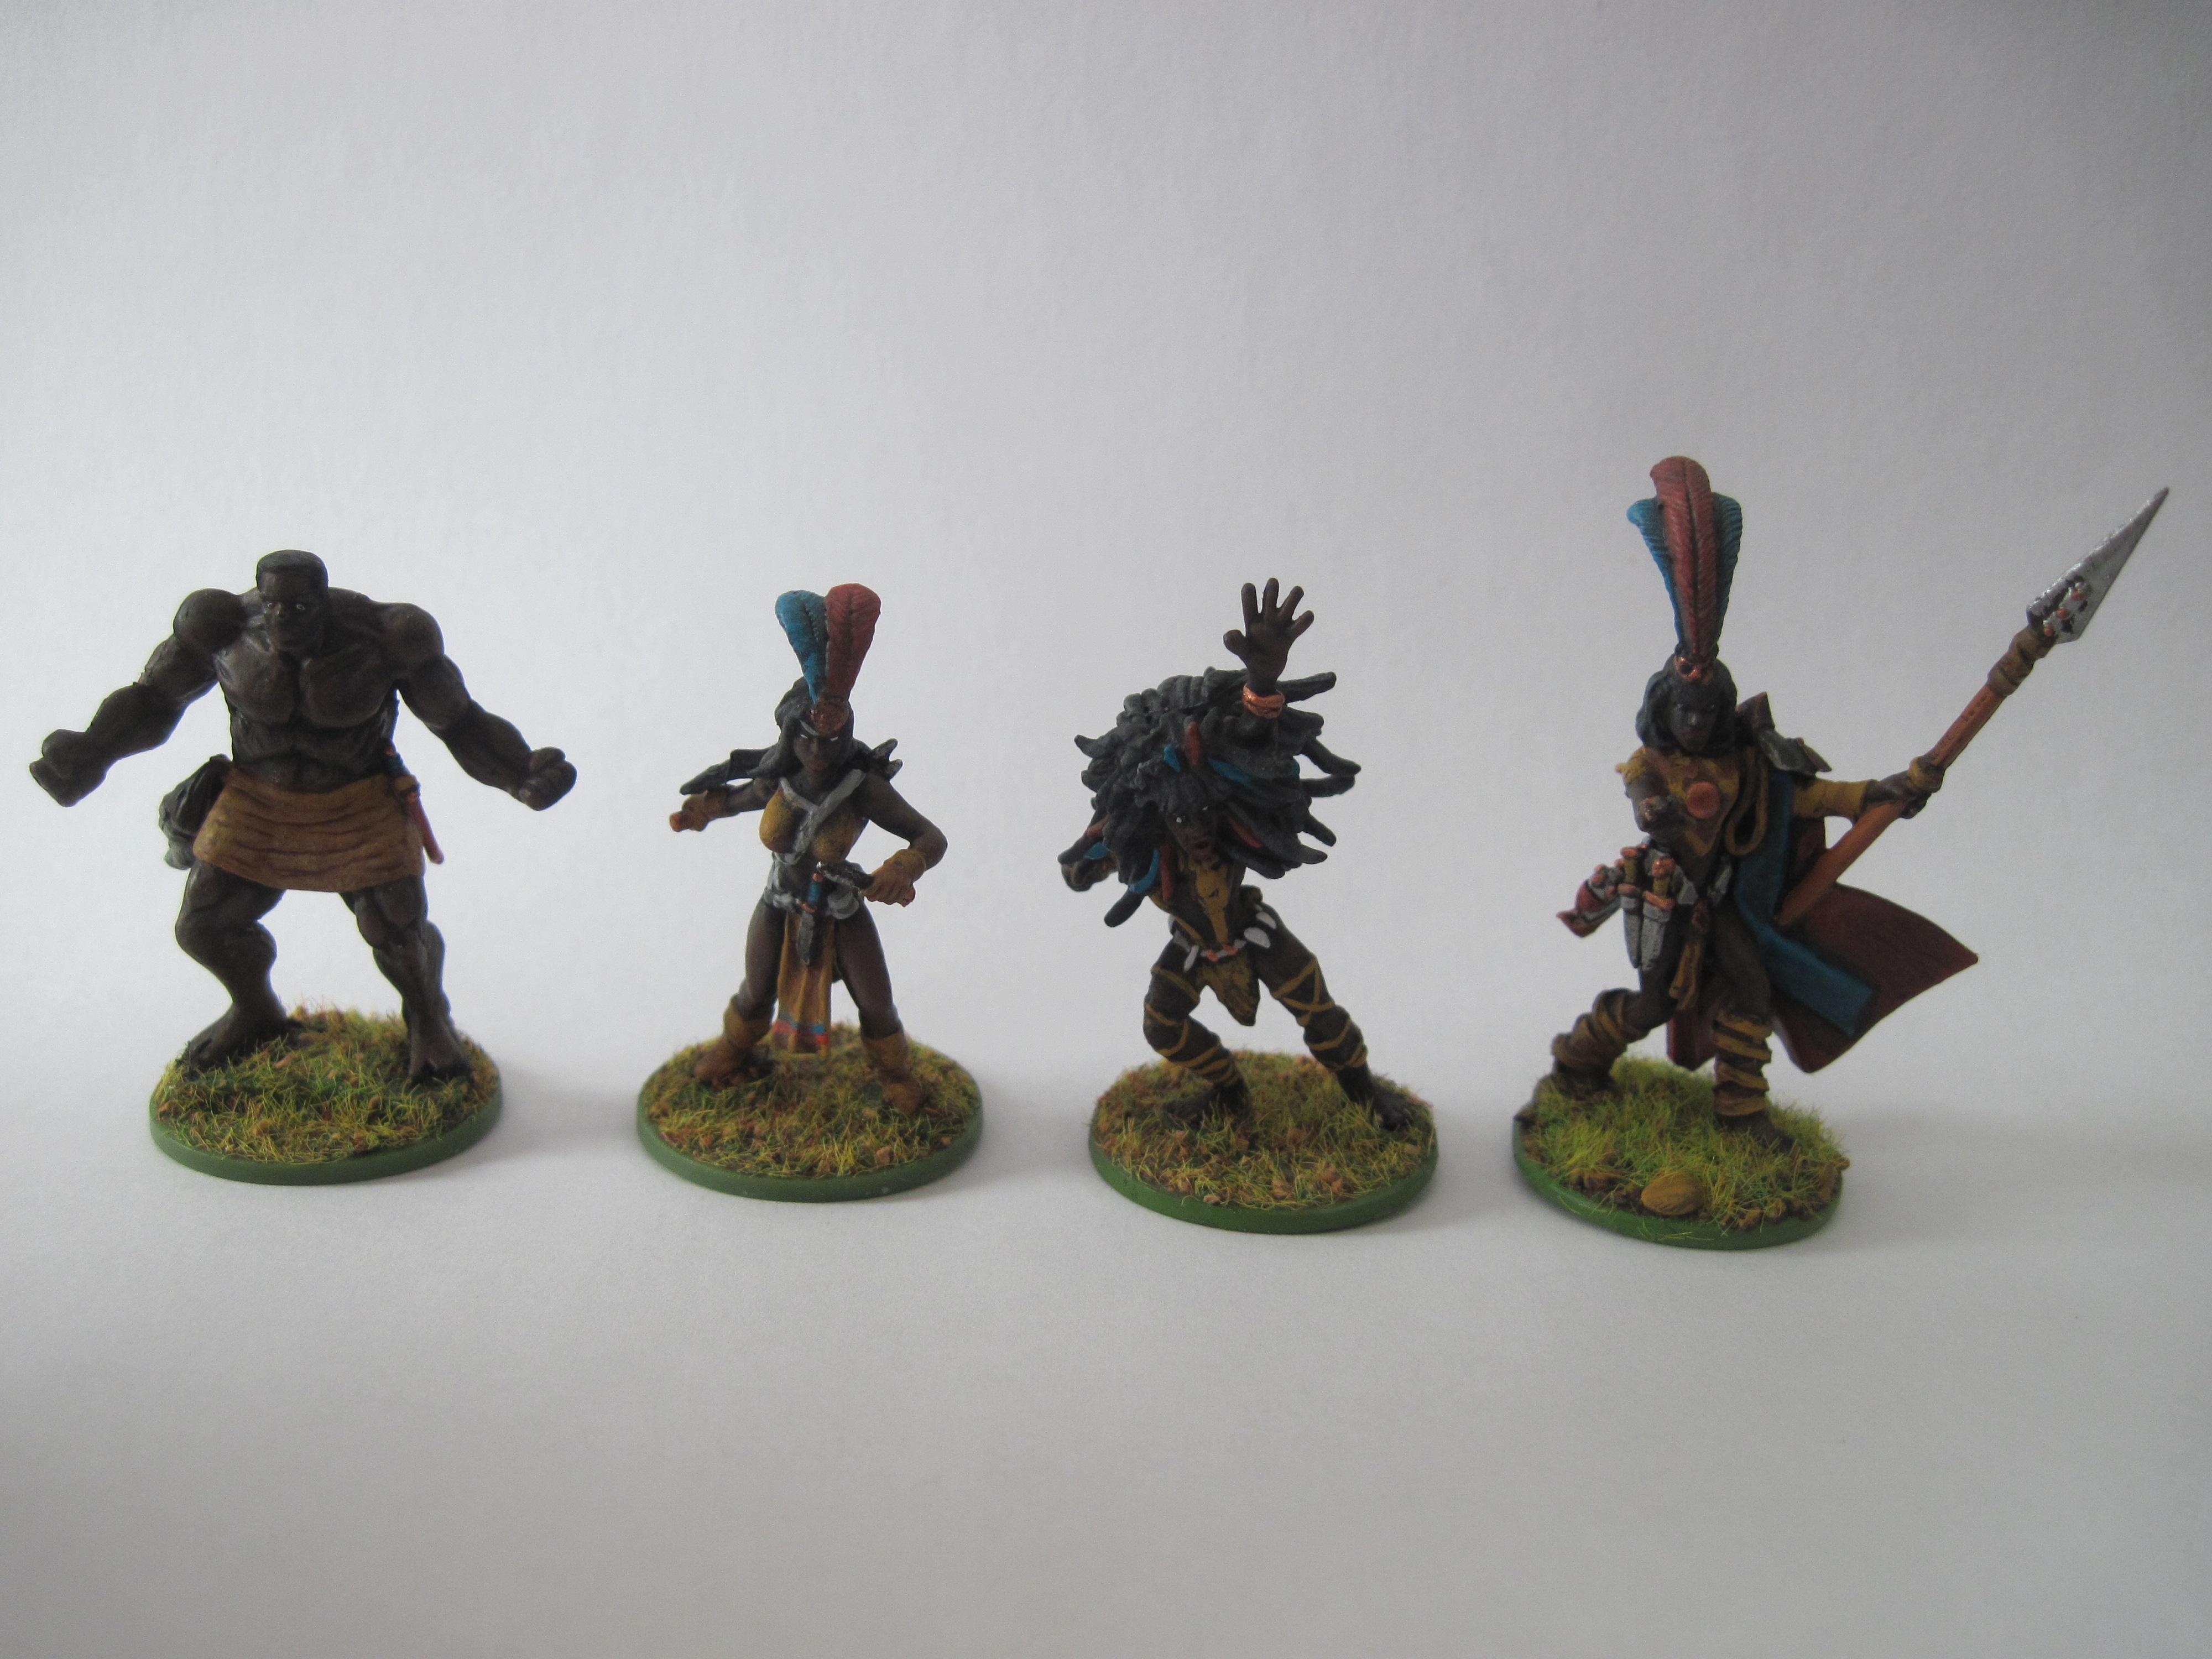 Amazon, Conversion, Goblins, Gorilla, Heroclix, Jungle, Pygmy, Toy